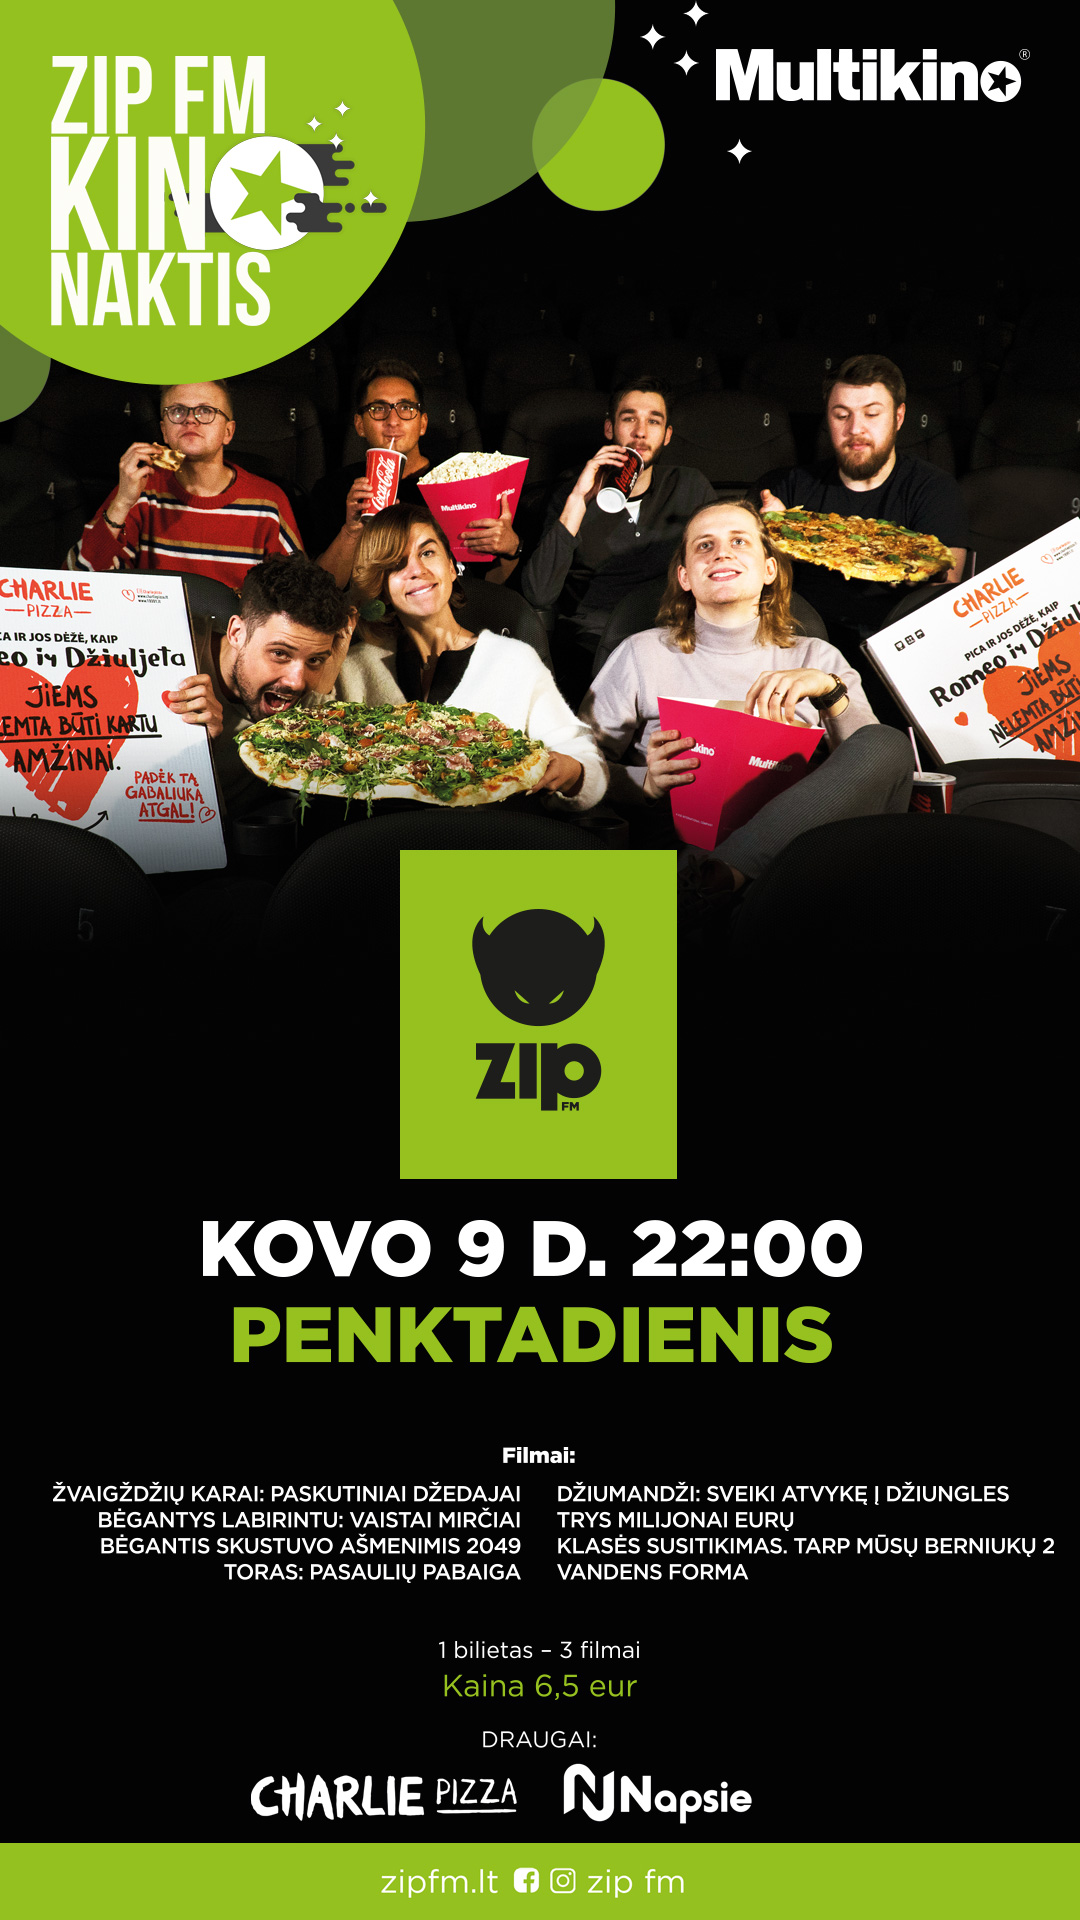 ZIP FM KINO NAKTIS vol.7